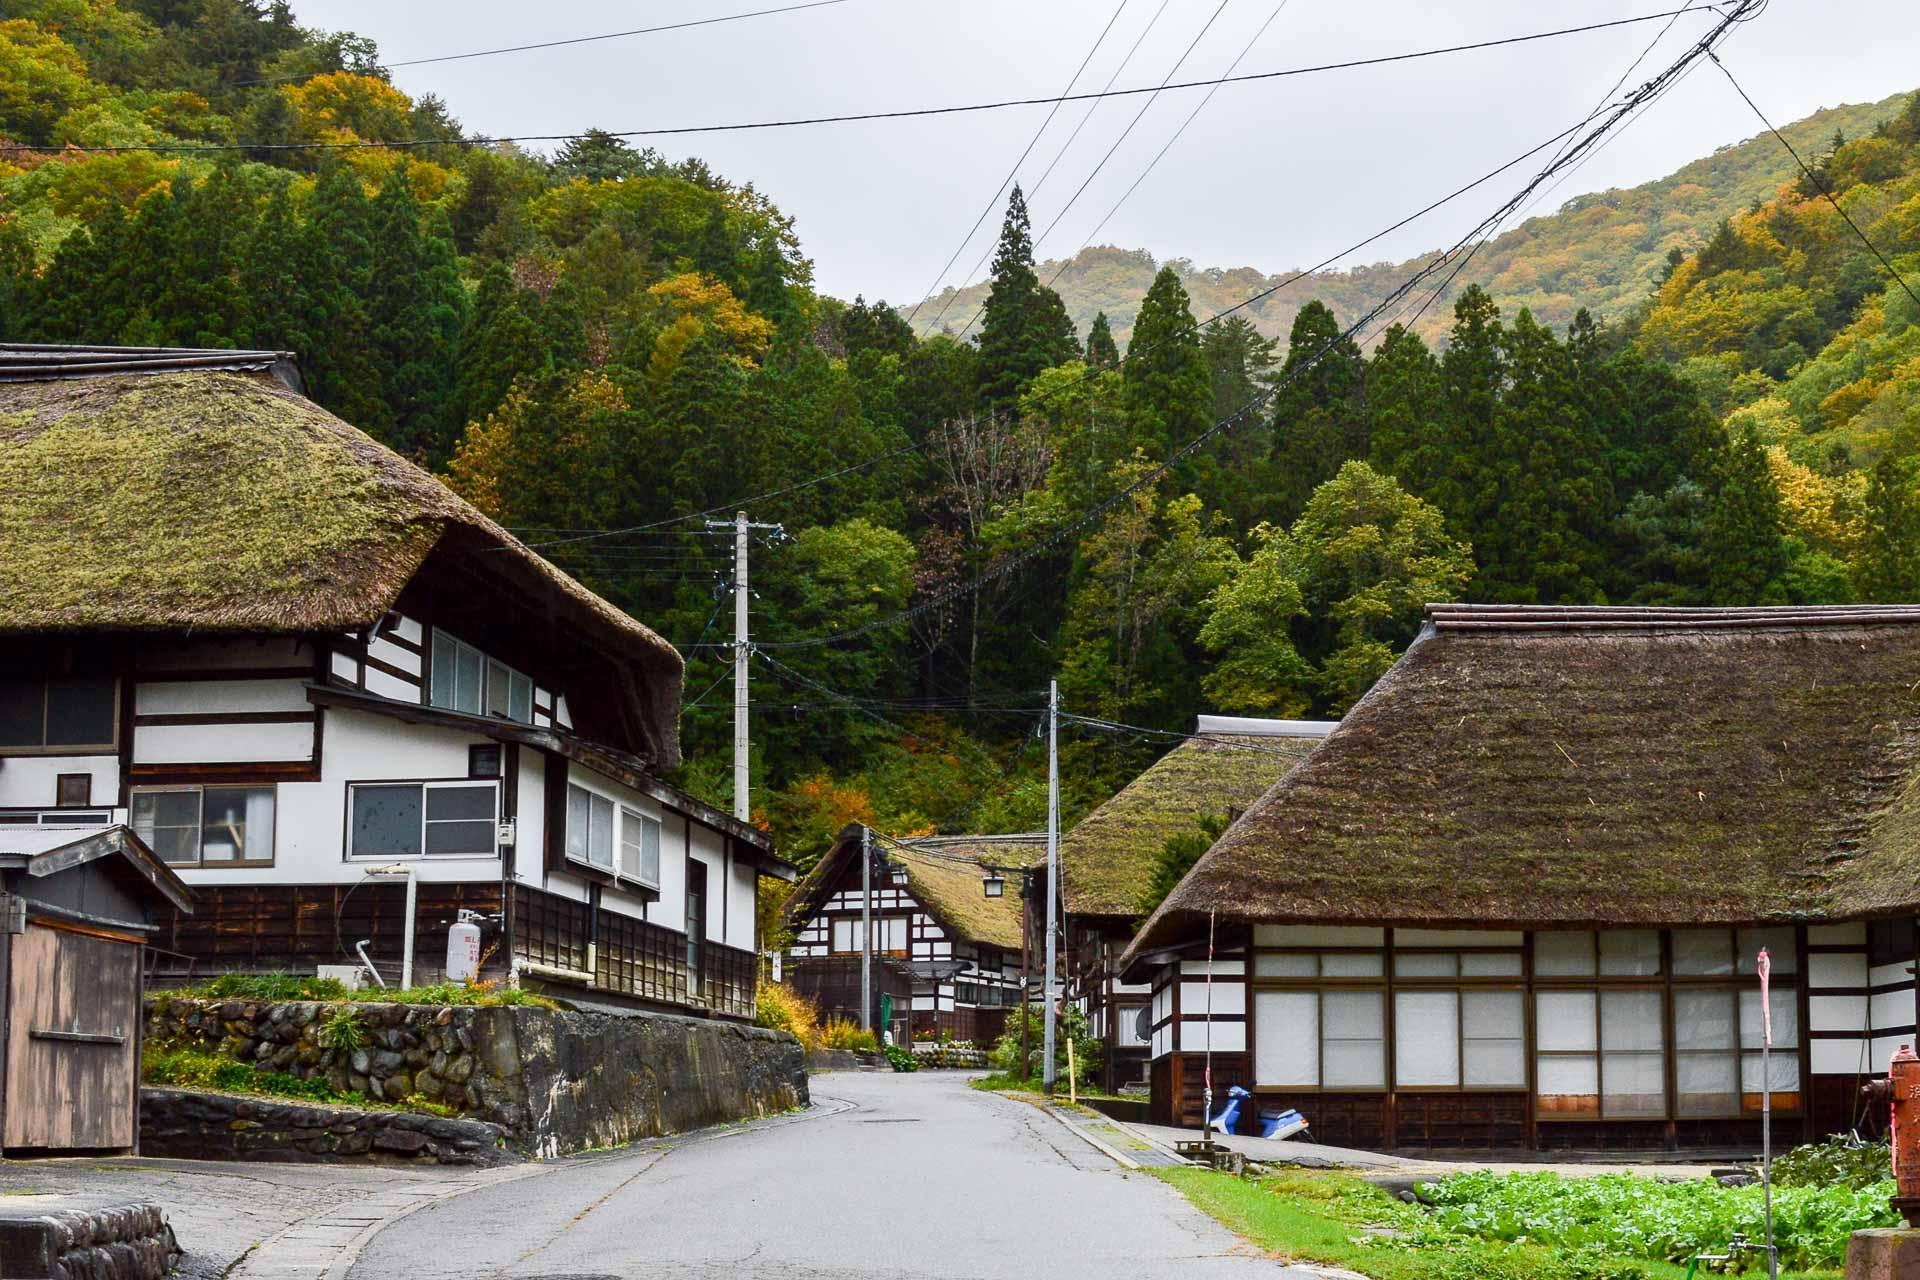 Le village reculé de Mazawa en automne.